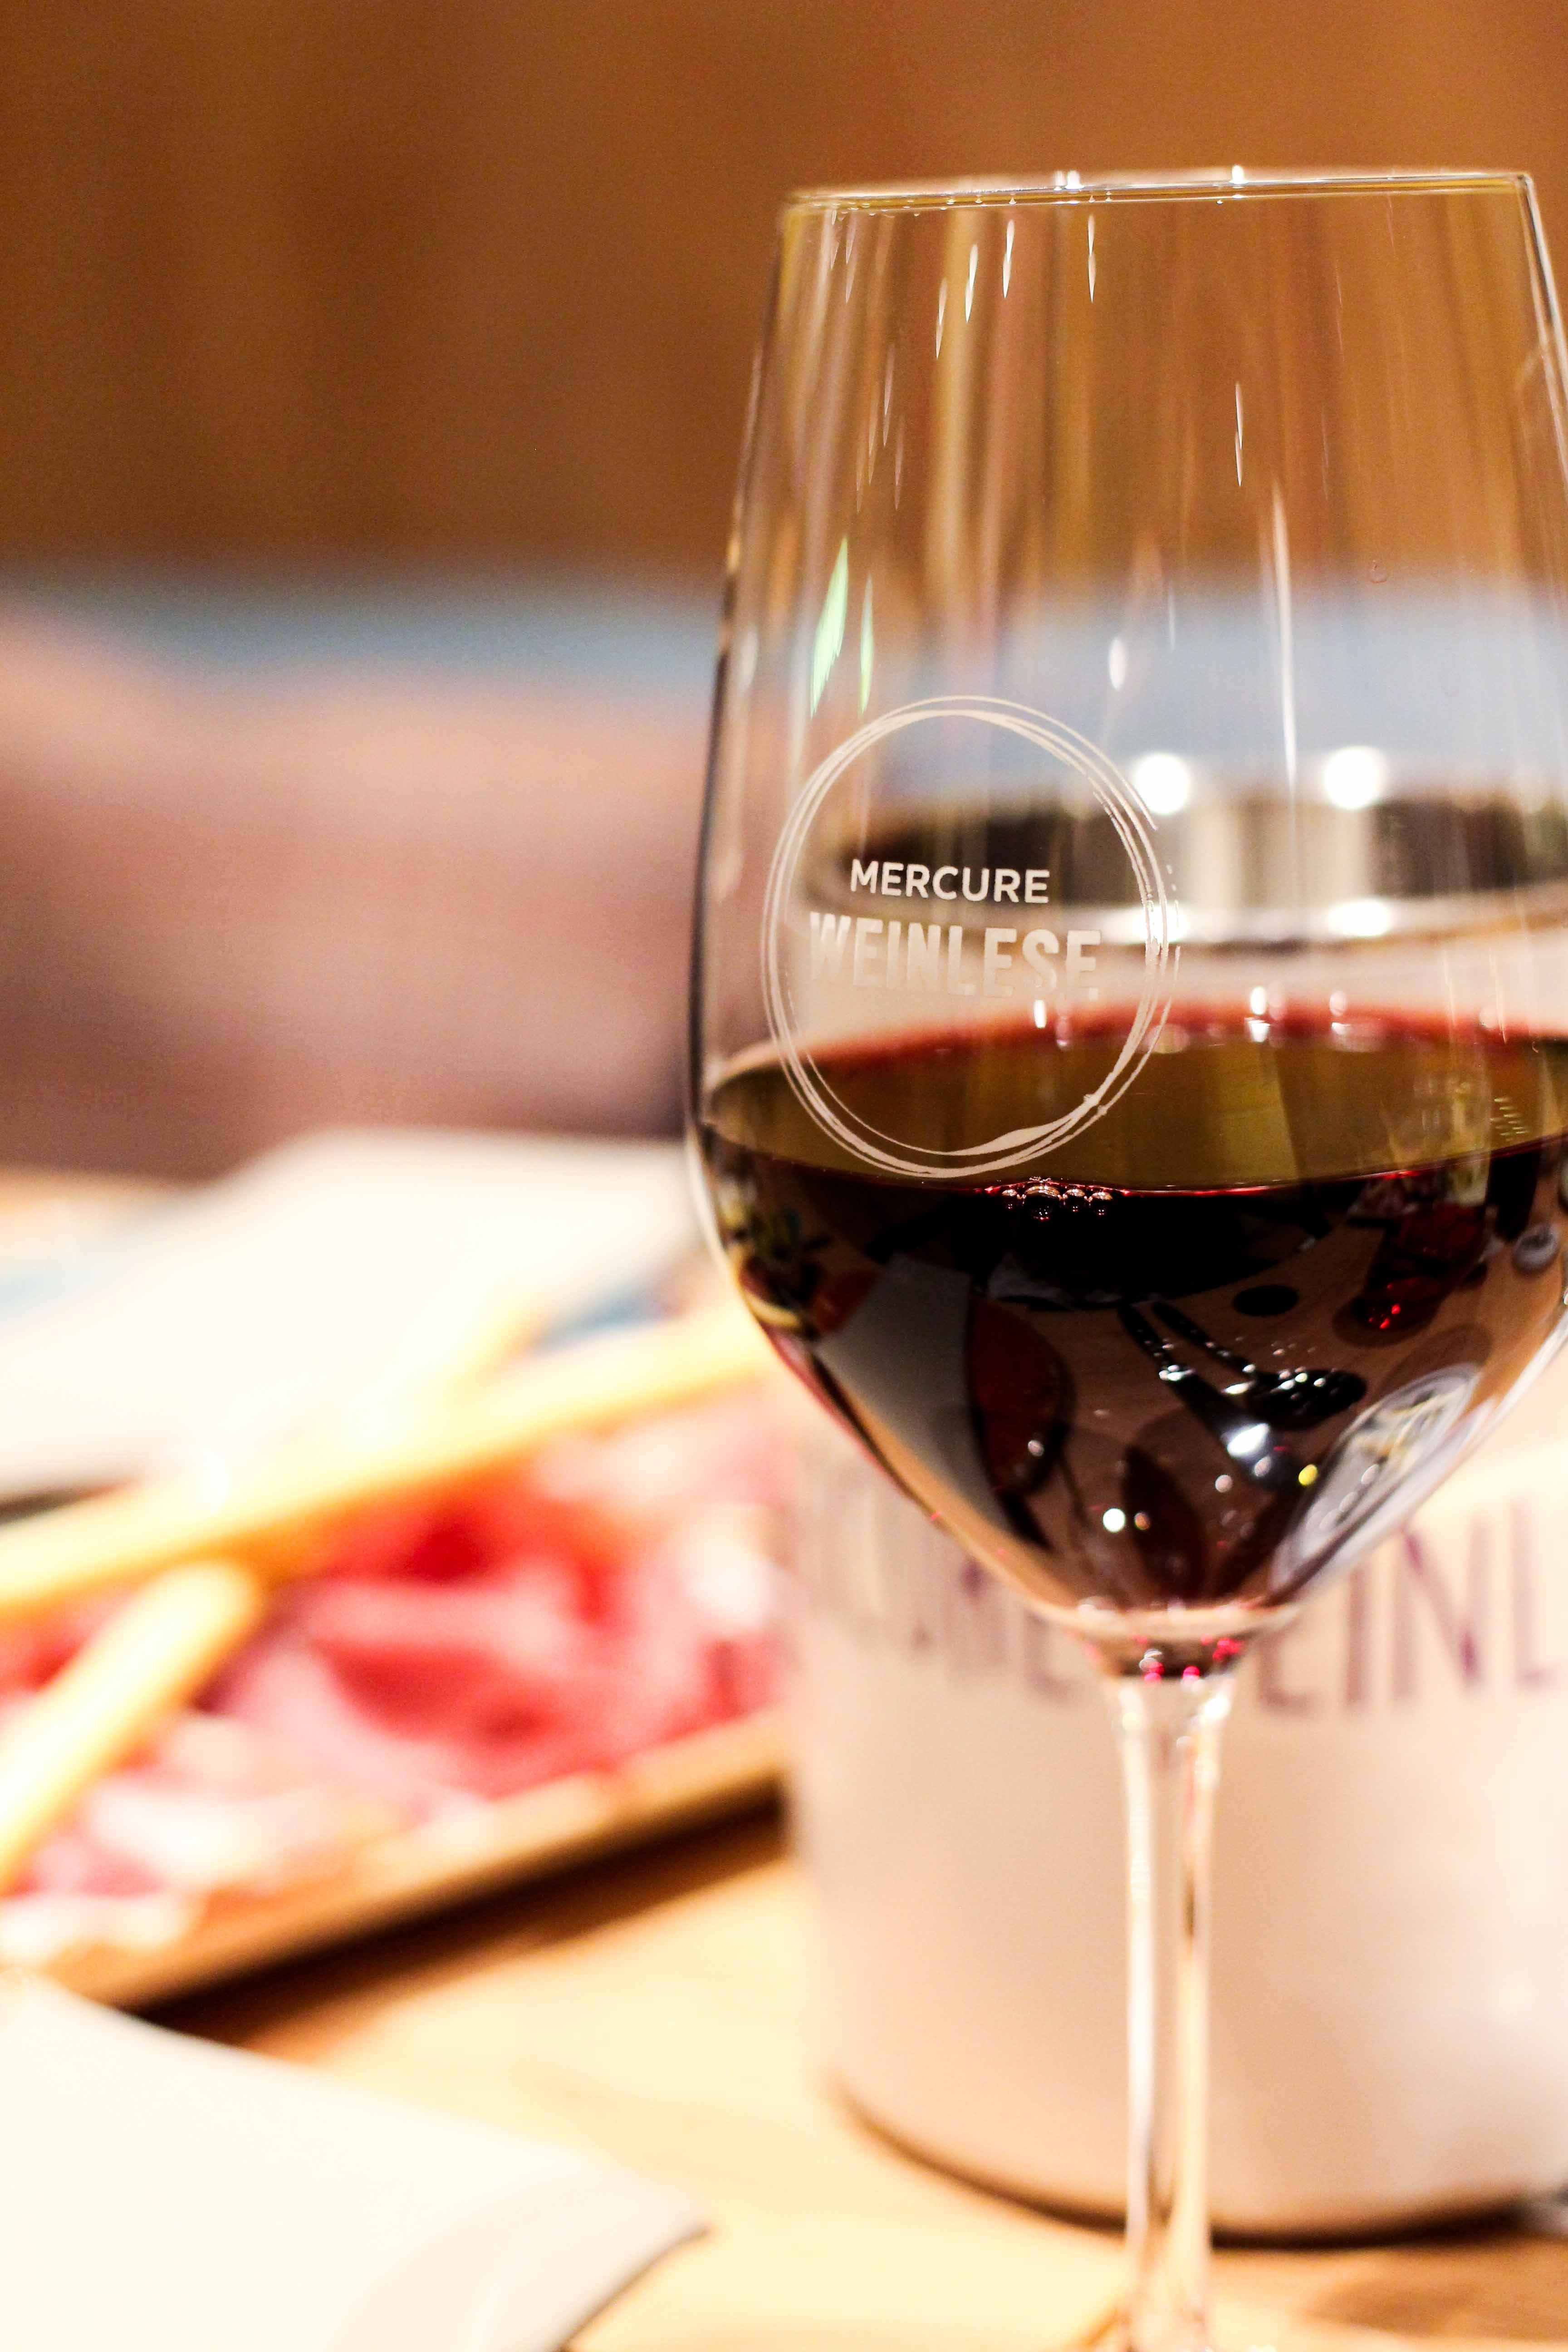 Mercure Weinlese Reiseblog Weinprobe Mercure Mannheim Rotweinglas